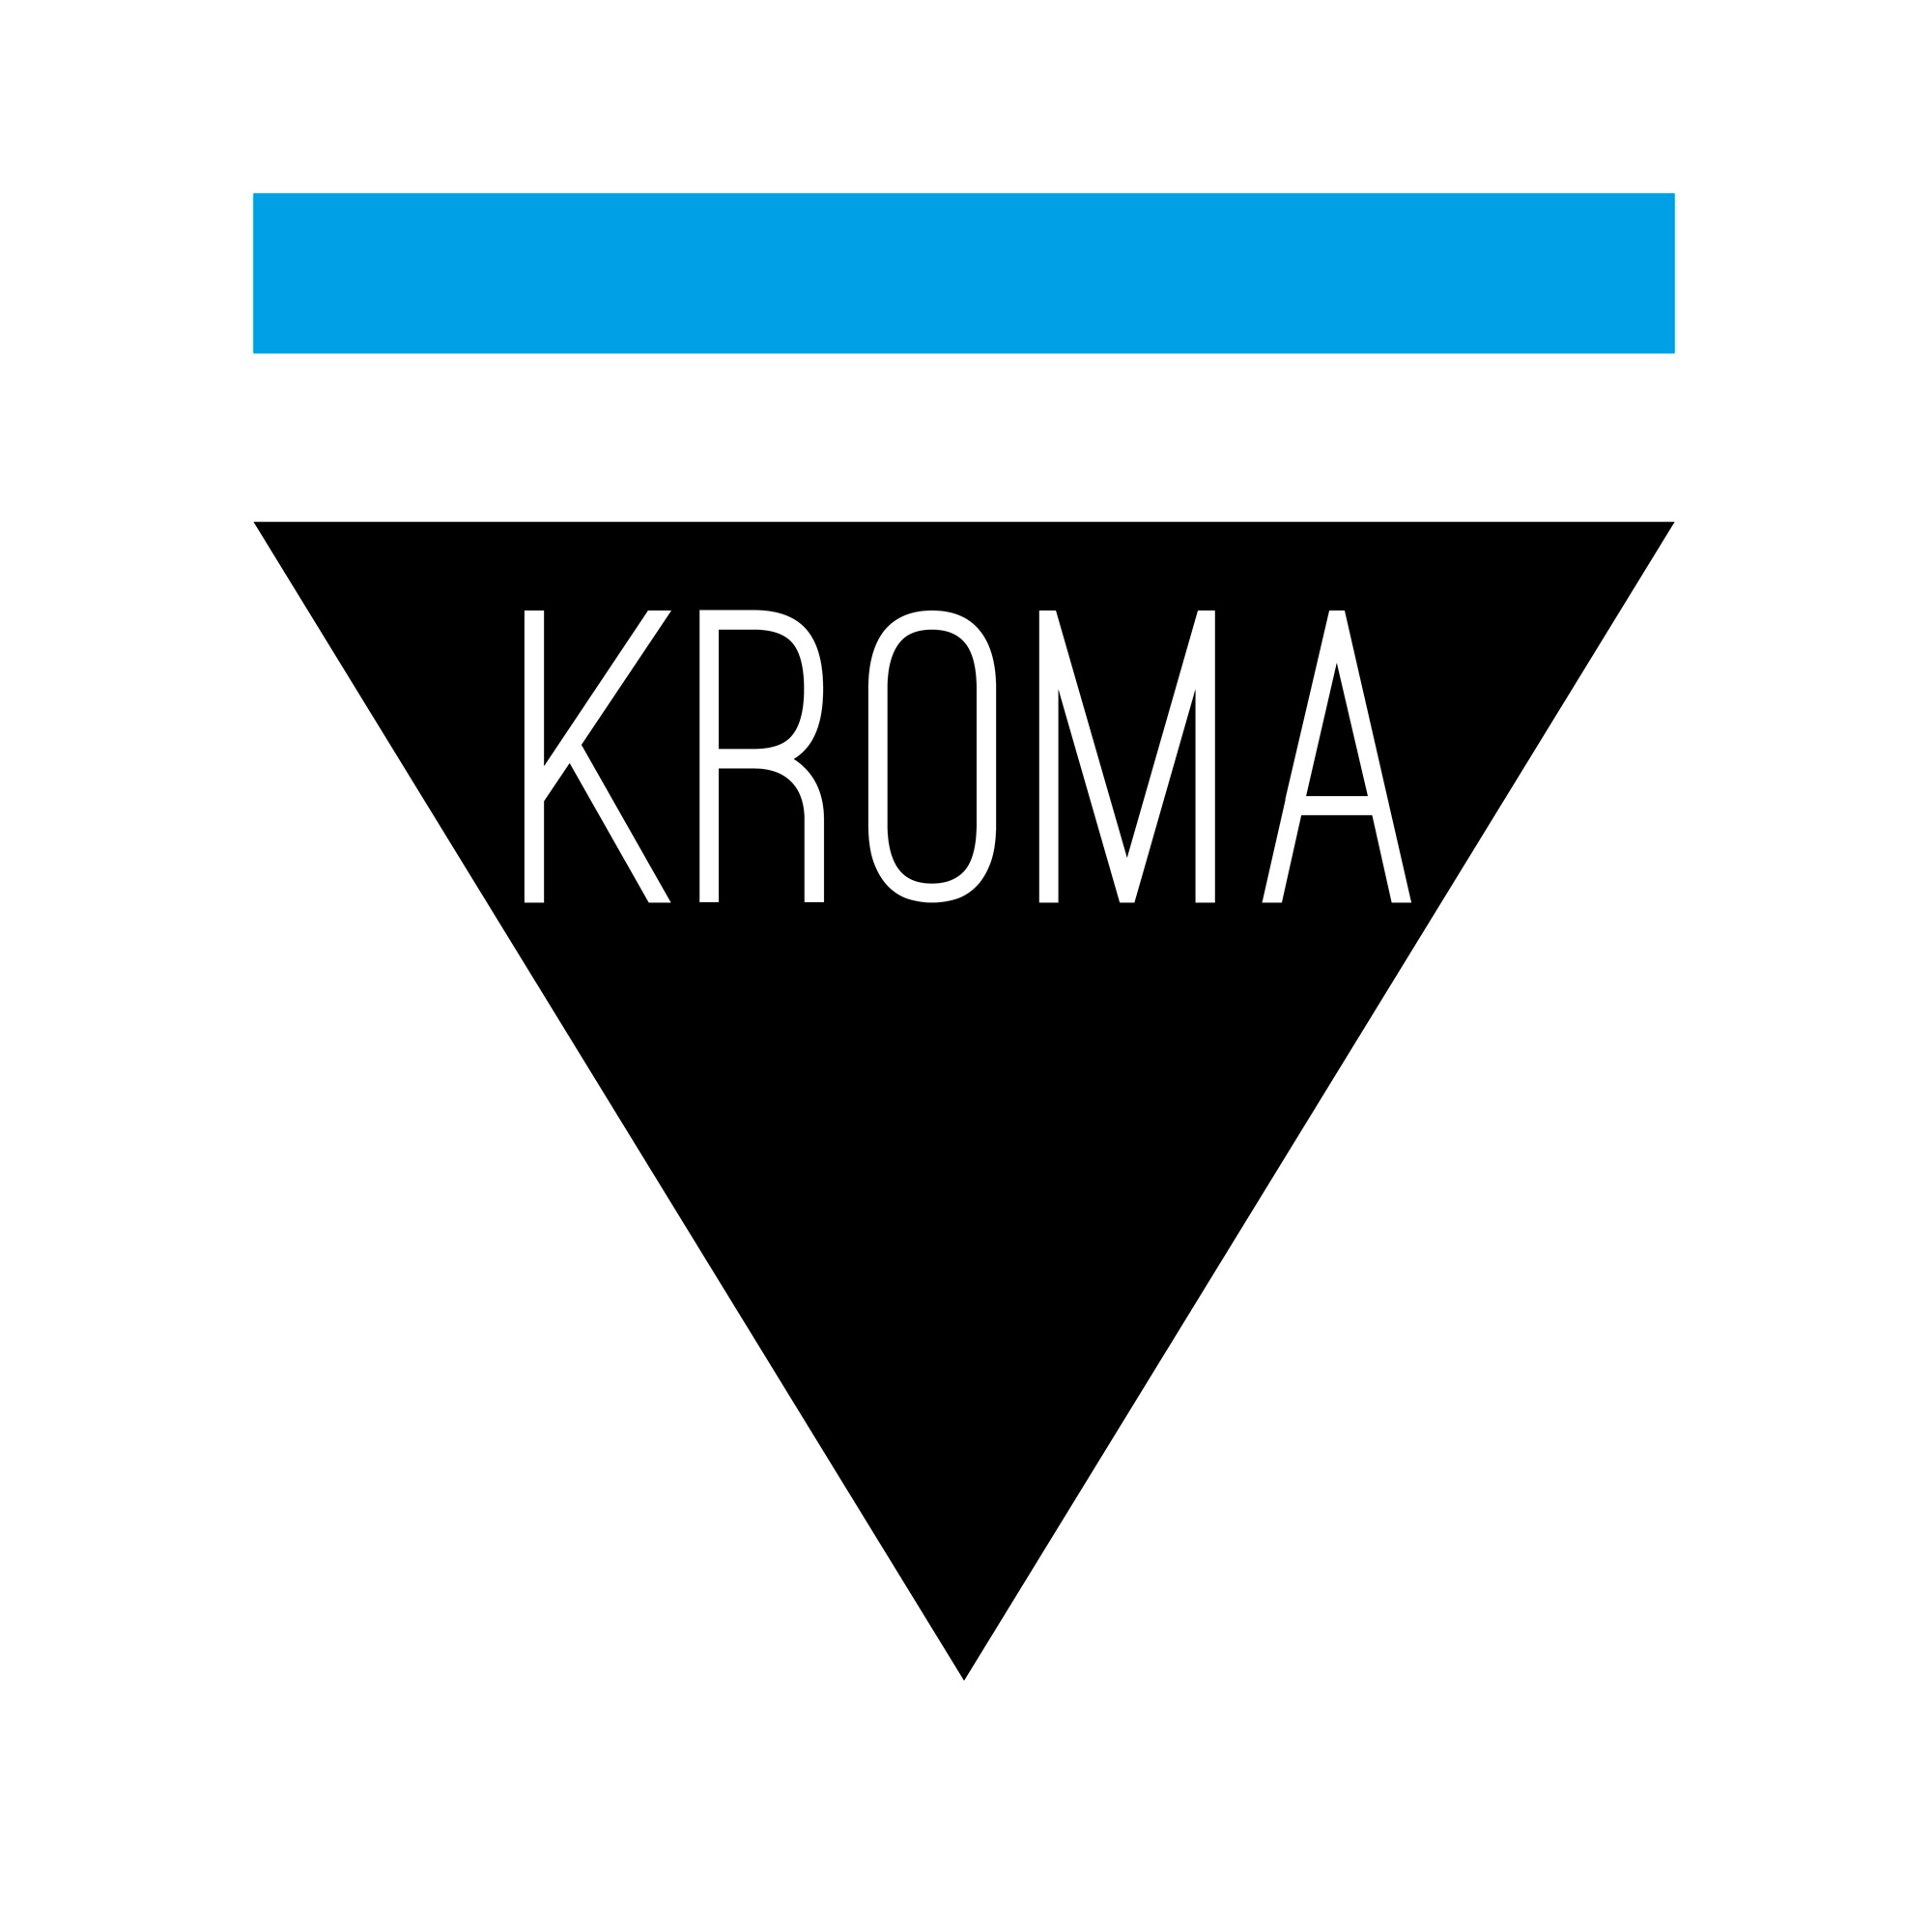 KROMA//logo